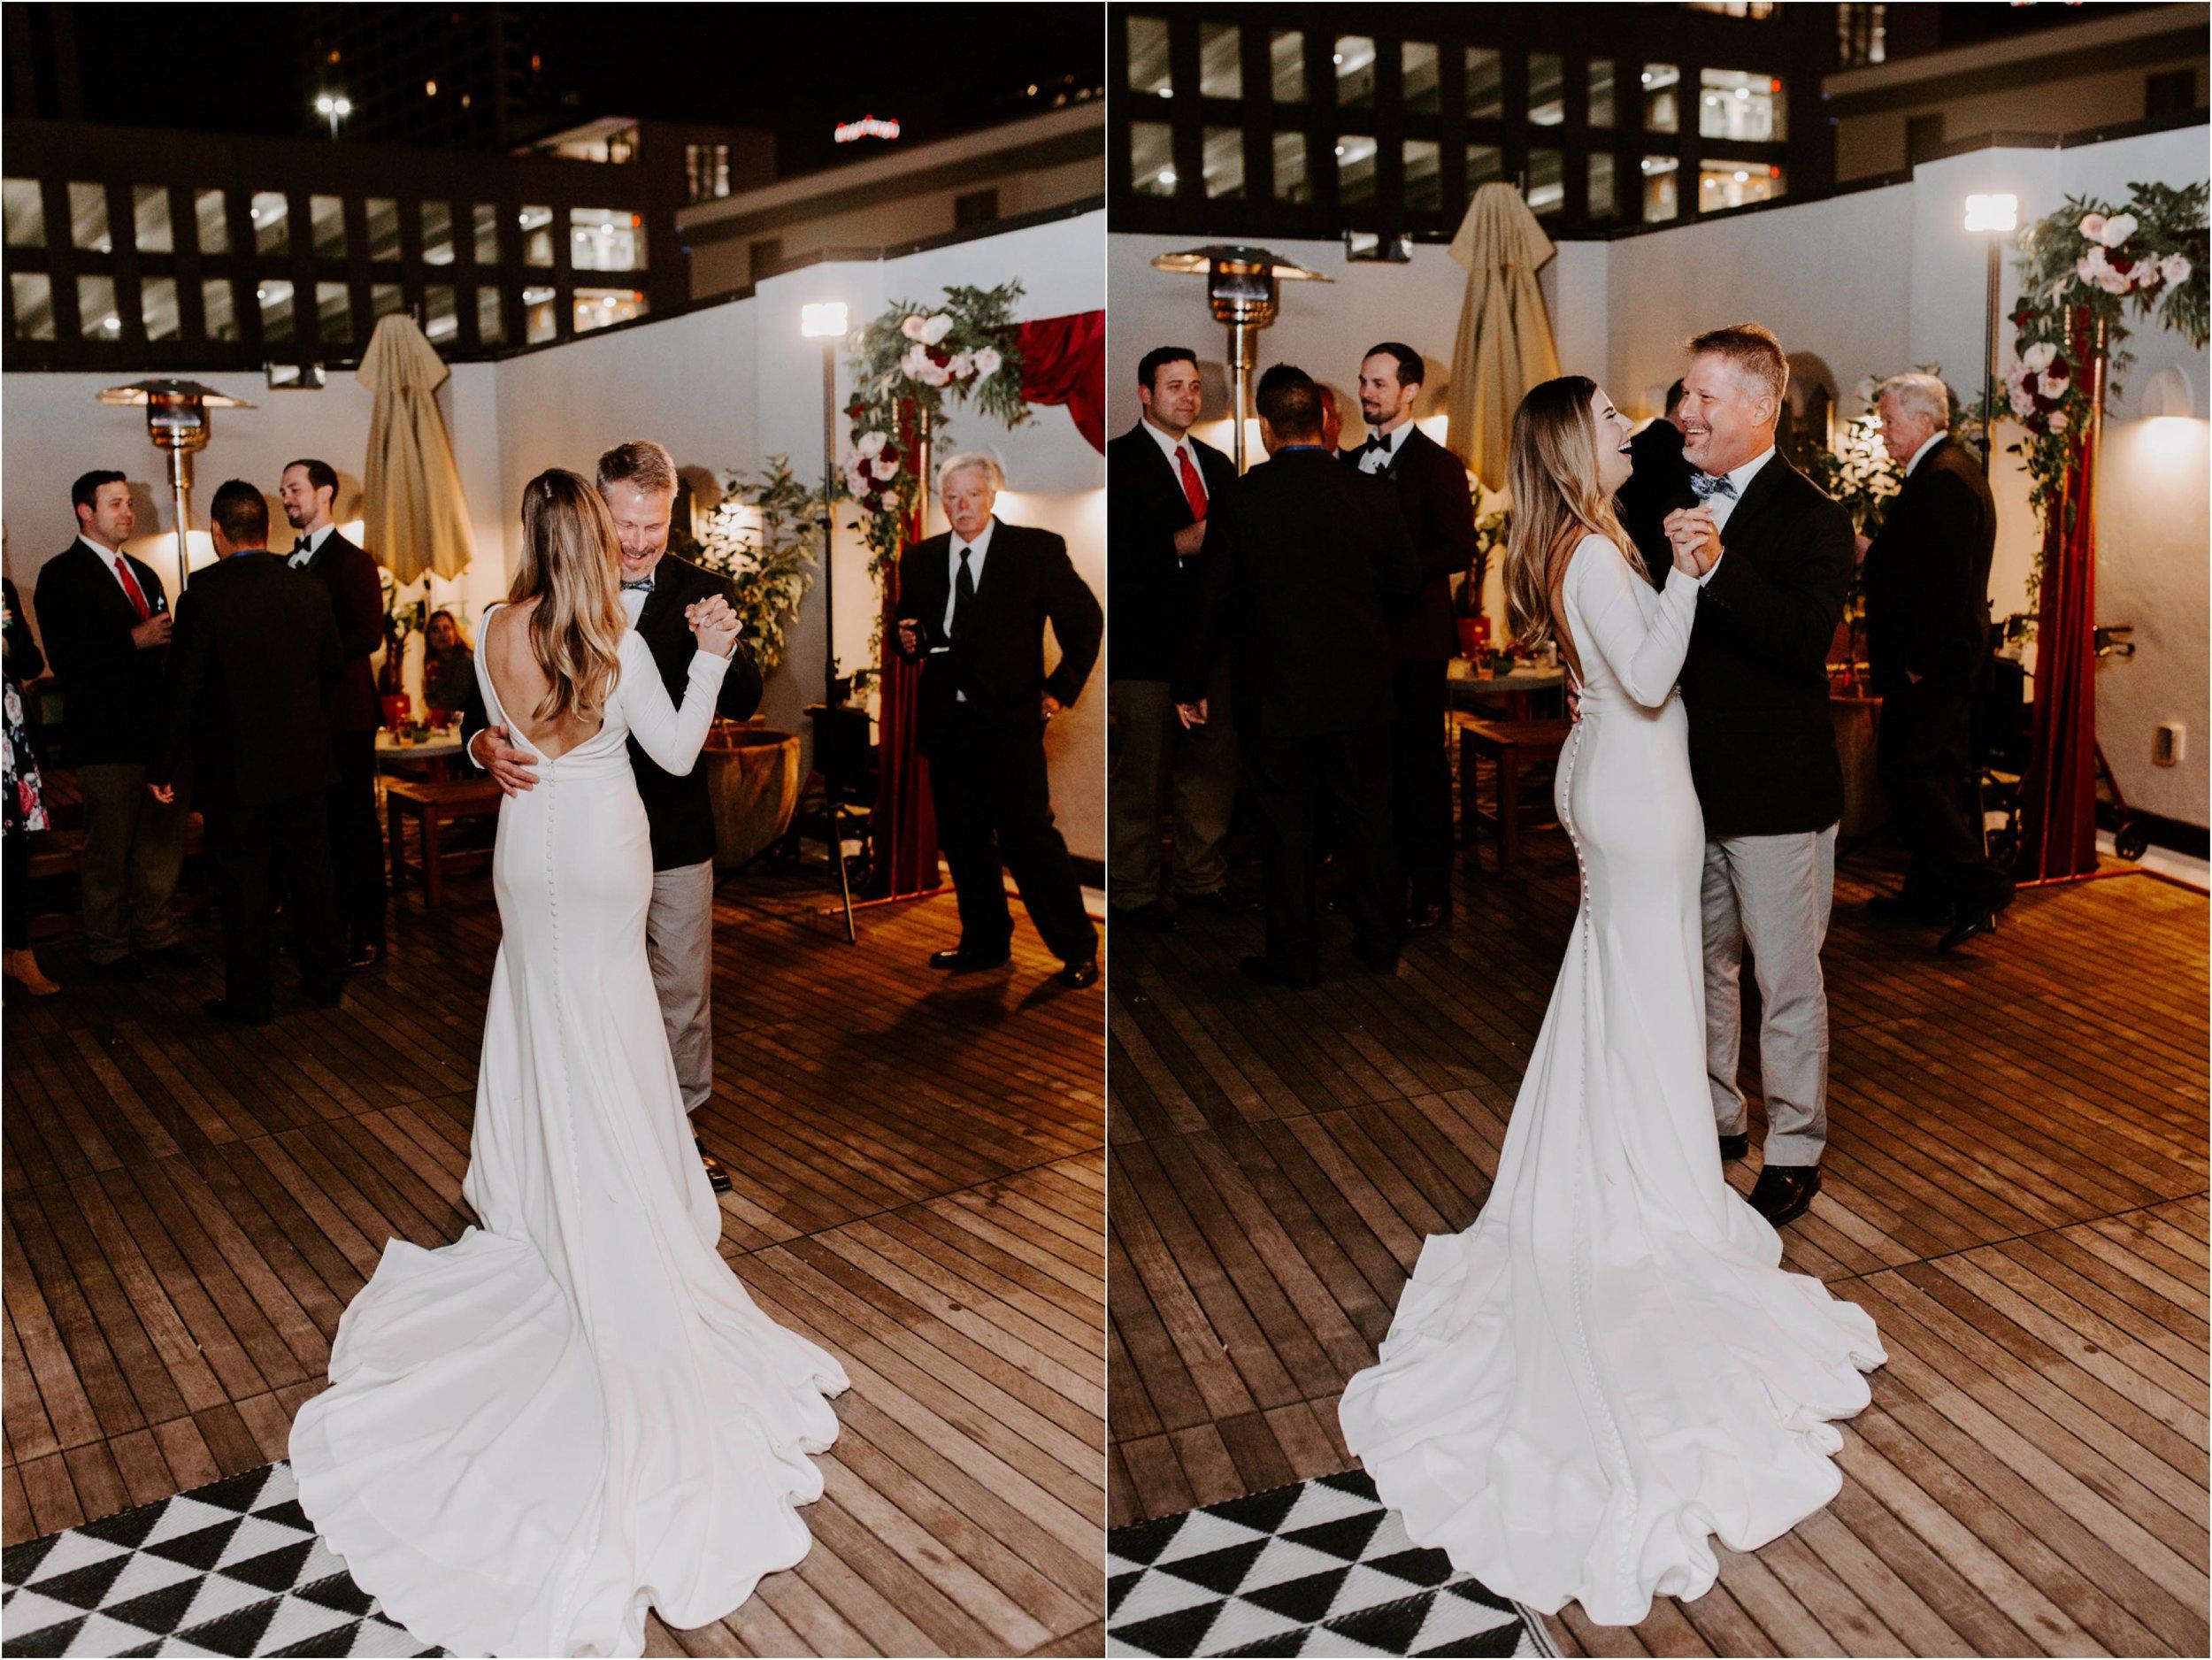 Catahoula Hotel Rooftop Wedding Reception New Orleans Wedding Photographer Ashley Biltz Photography15.jpg